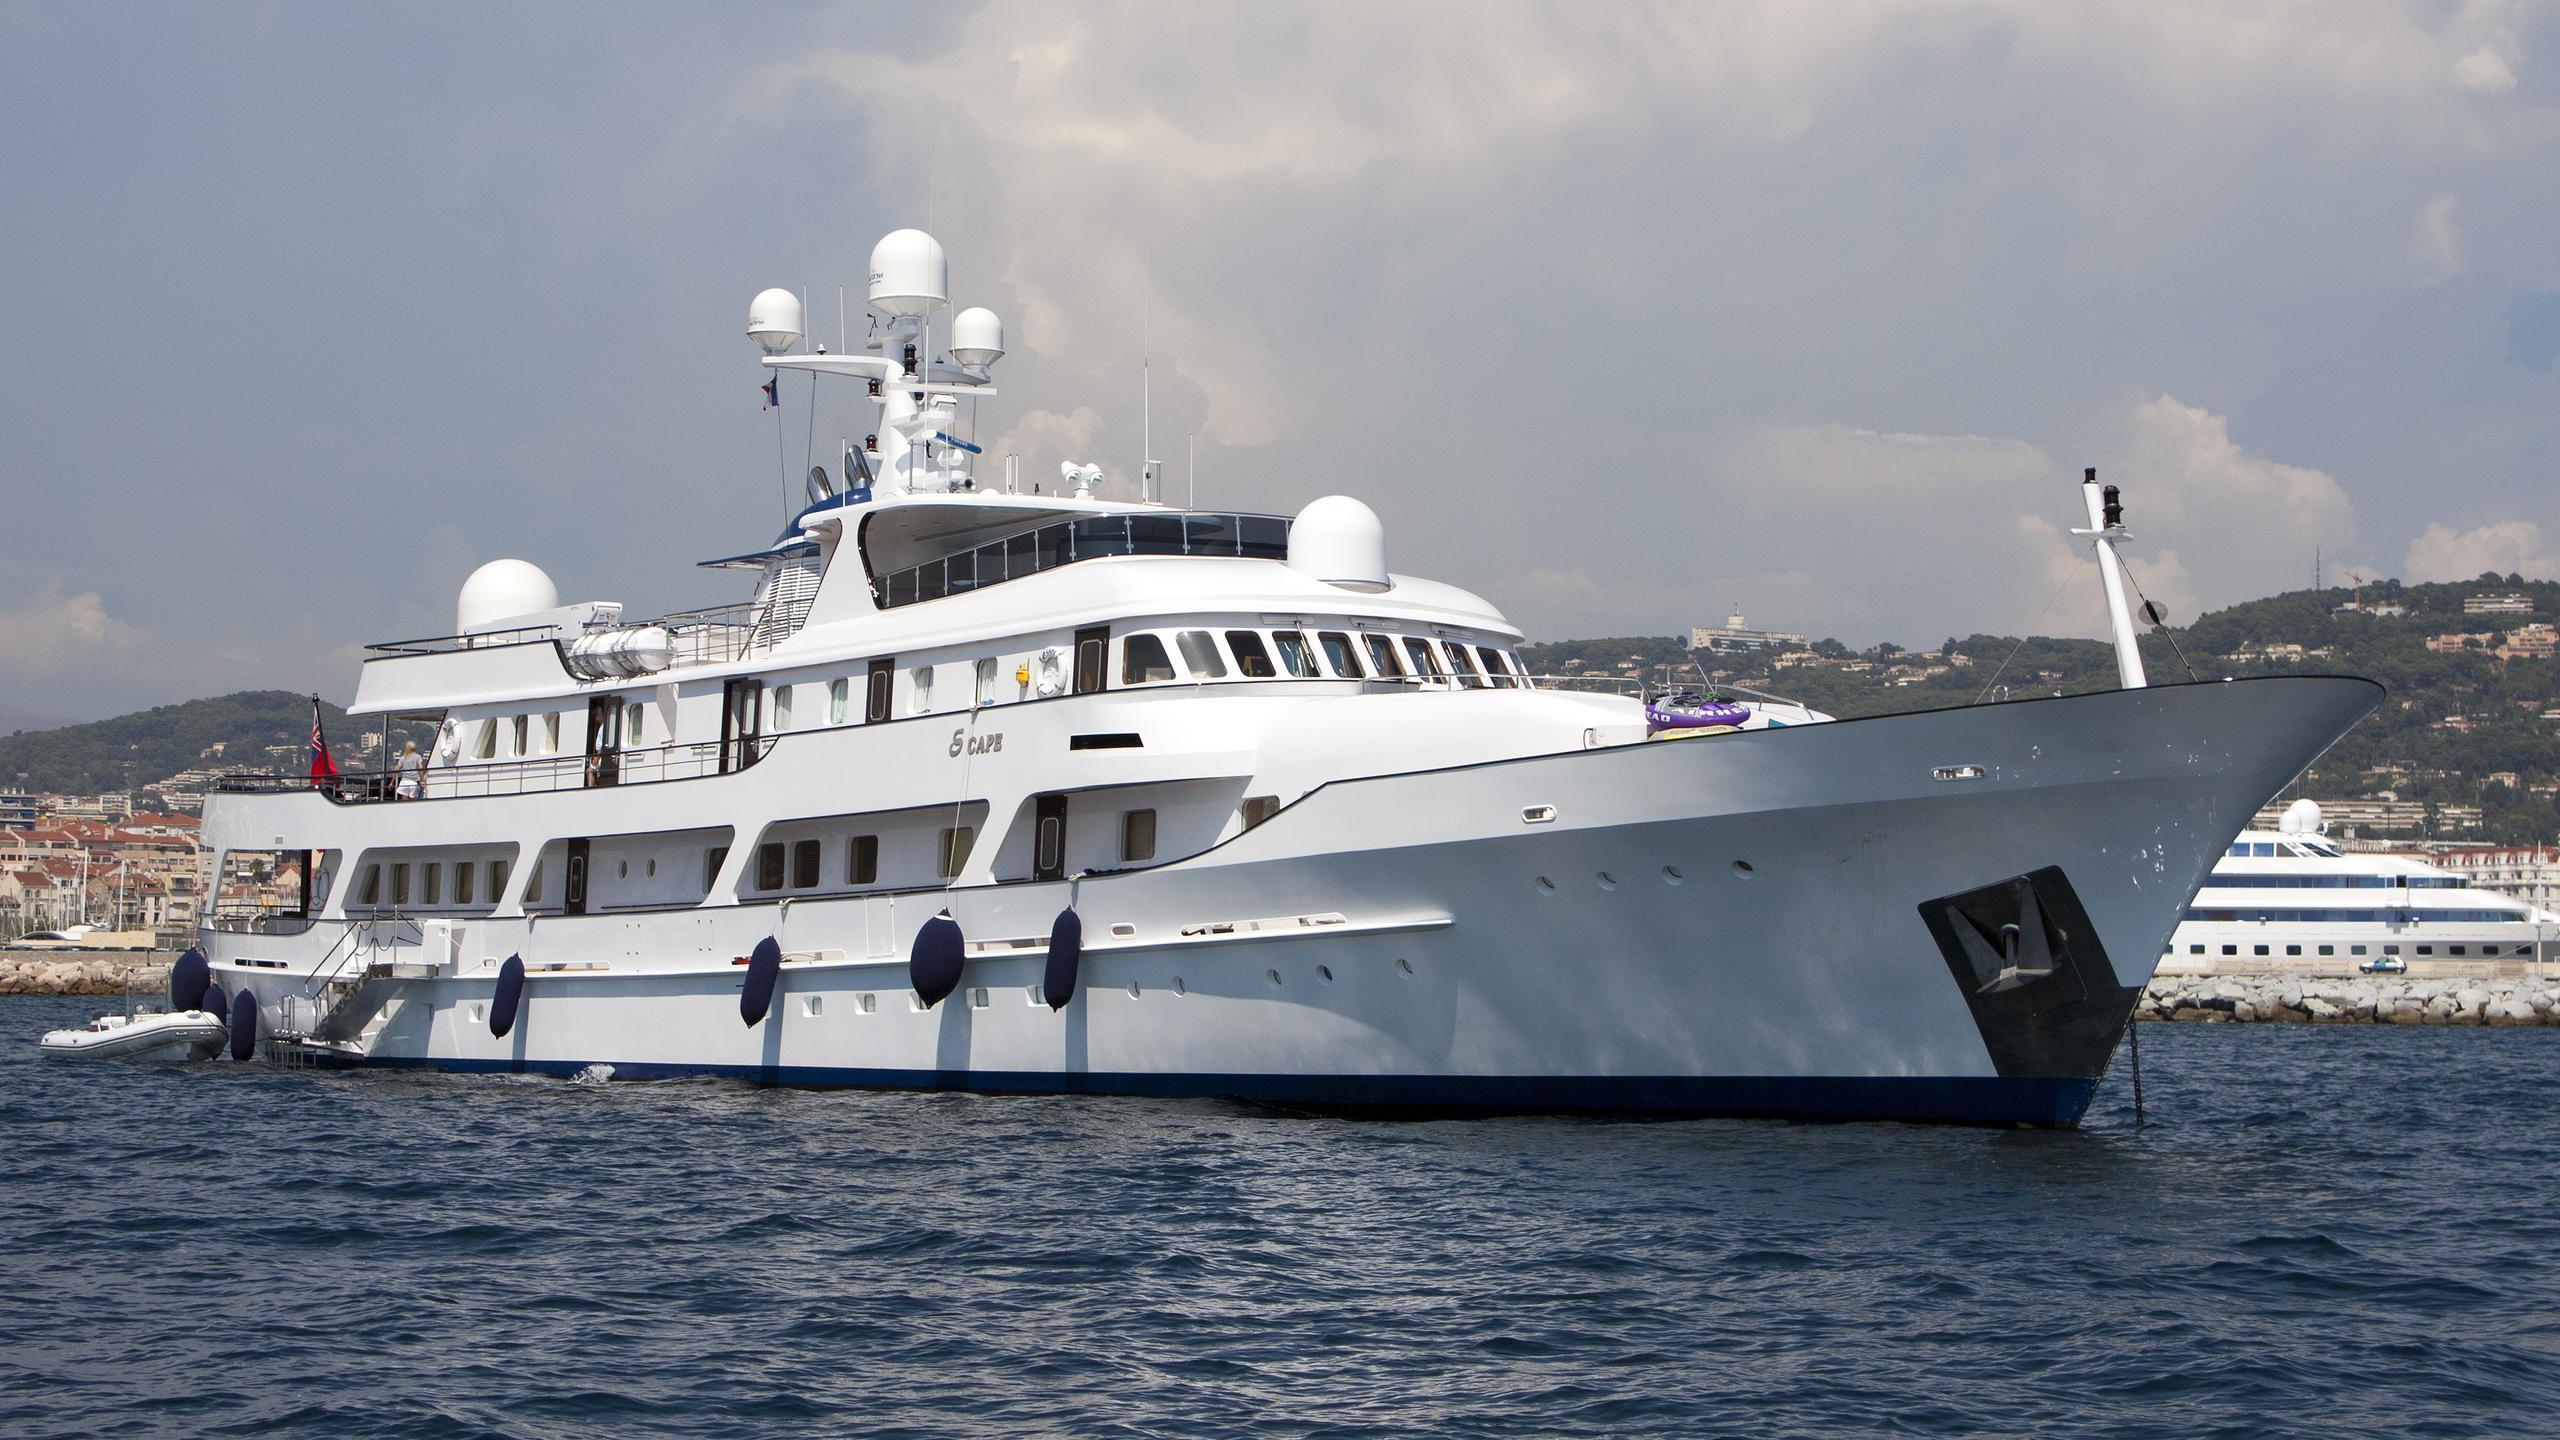 meserret-ii-motor-yacht-cammenga-1978-57m-half-profile